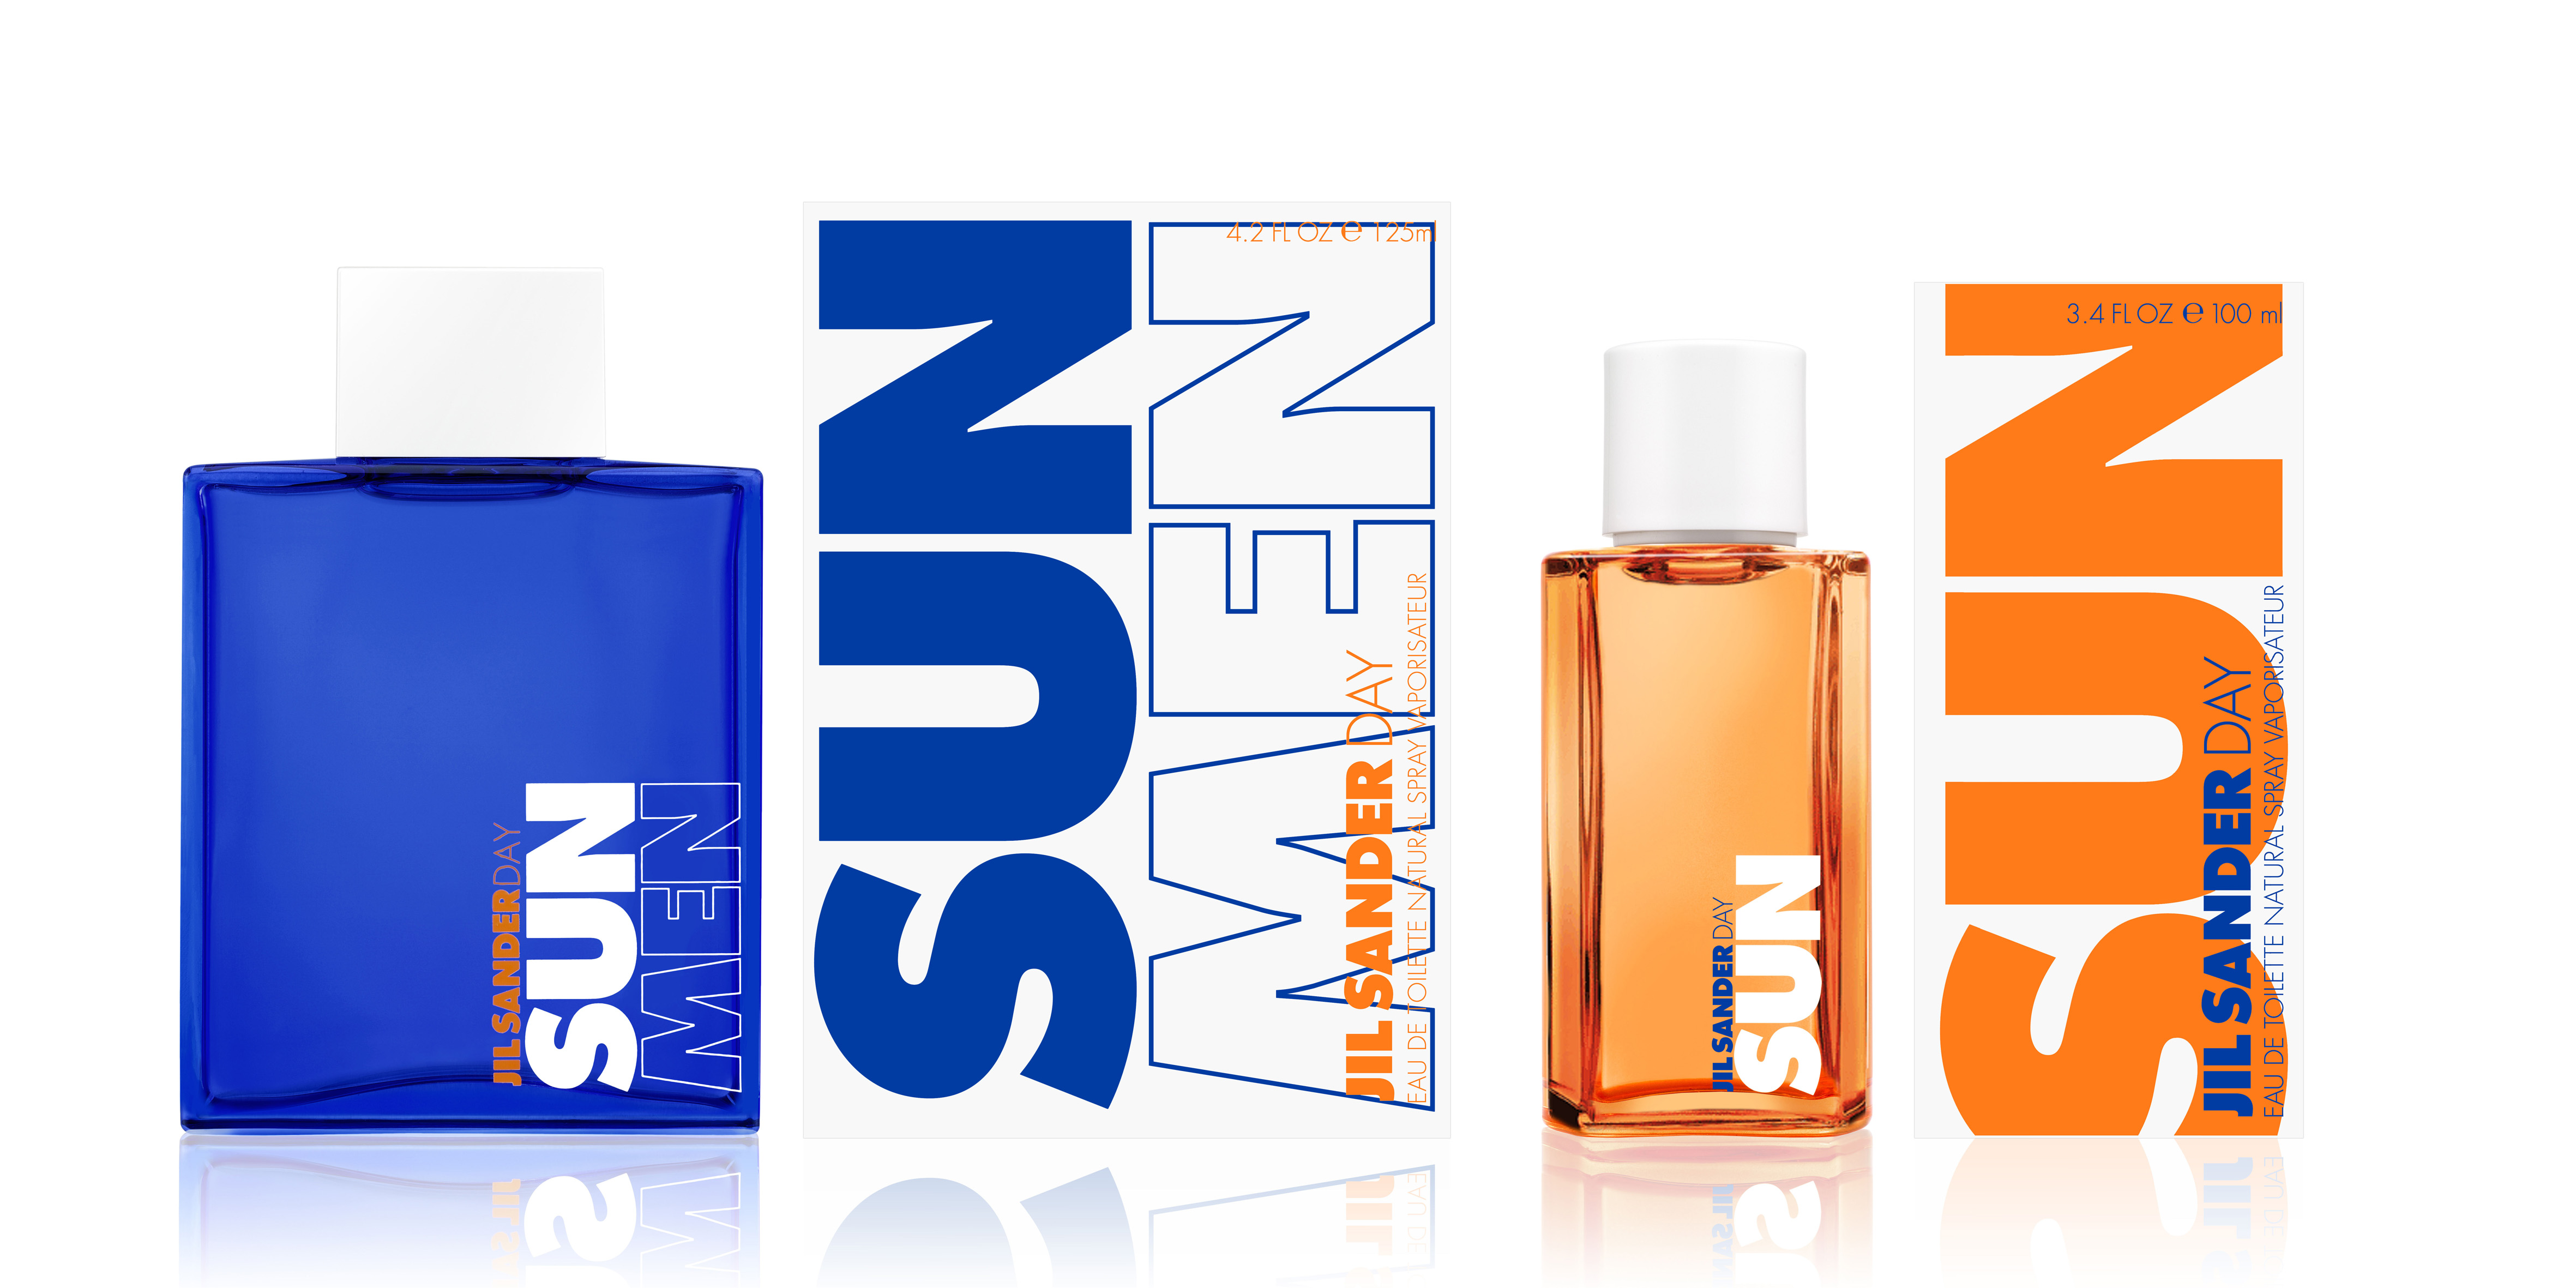 sun day jil sander perfume a fragrance for women 2013. Black Bedroom Furniture Sets. Home Design Ideas